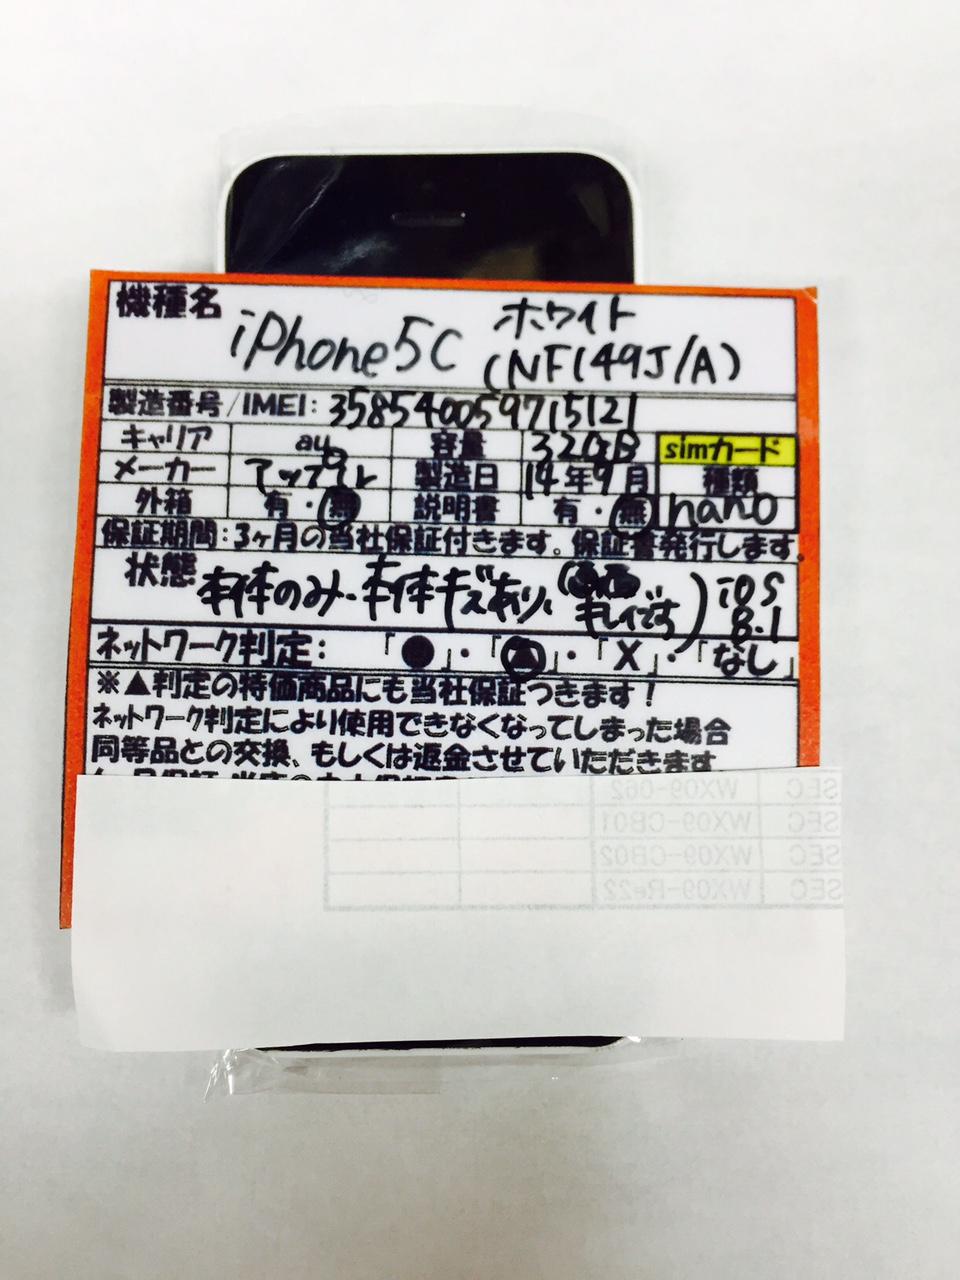 au iPhone5C ネットワーク判定 本体のみ